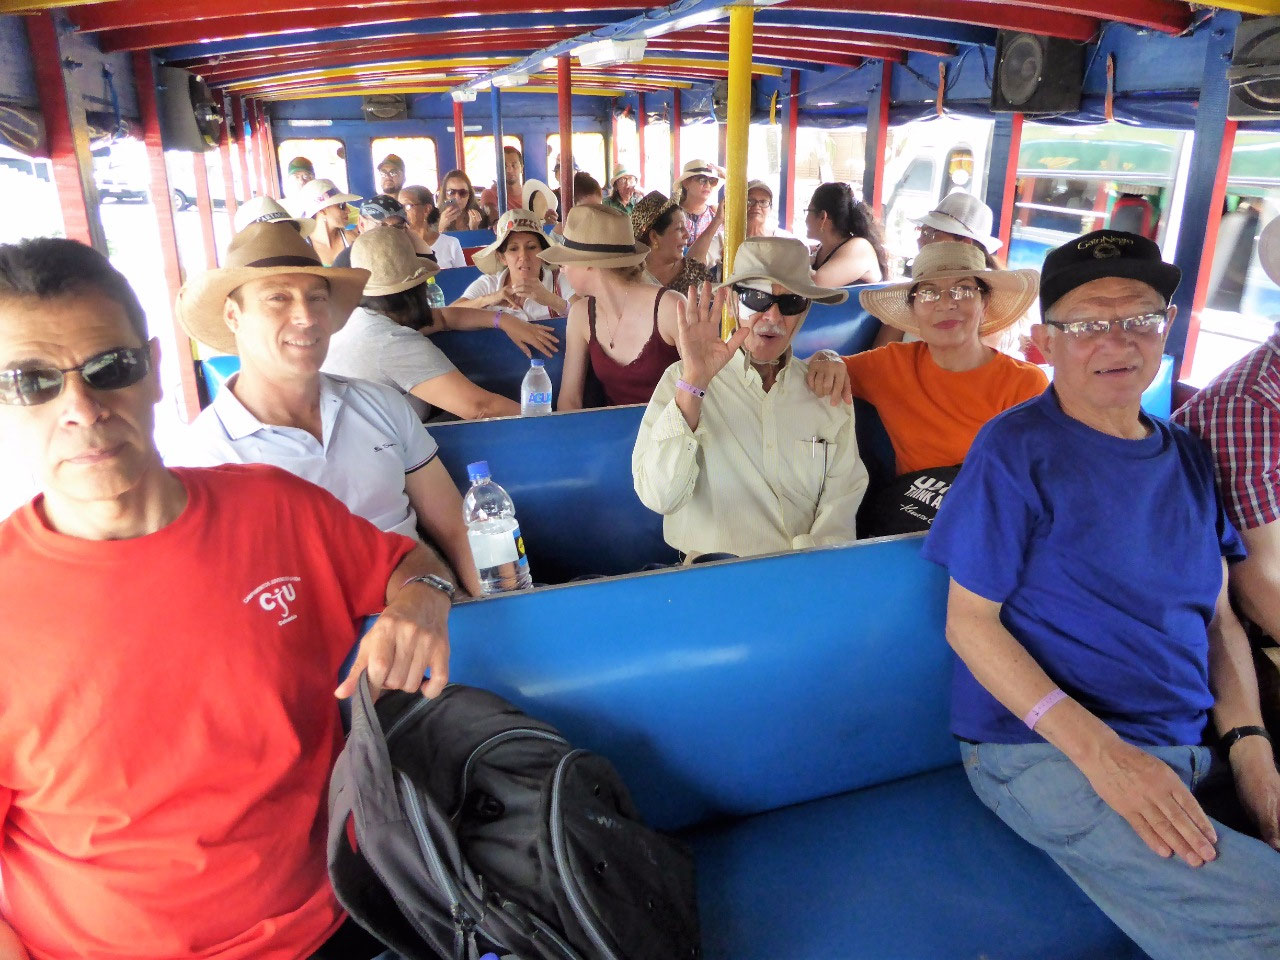 On a Chiva adventure